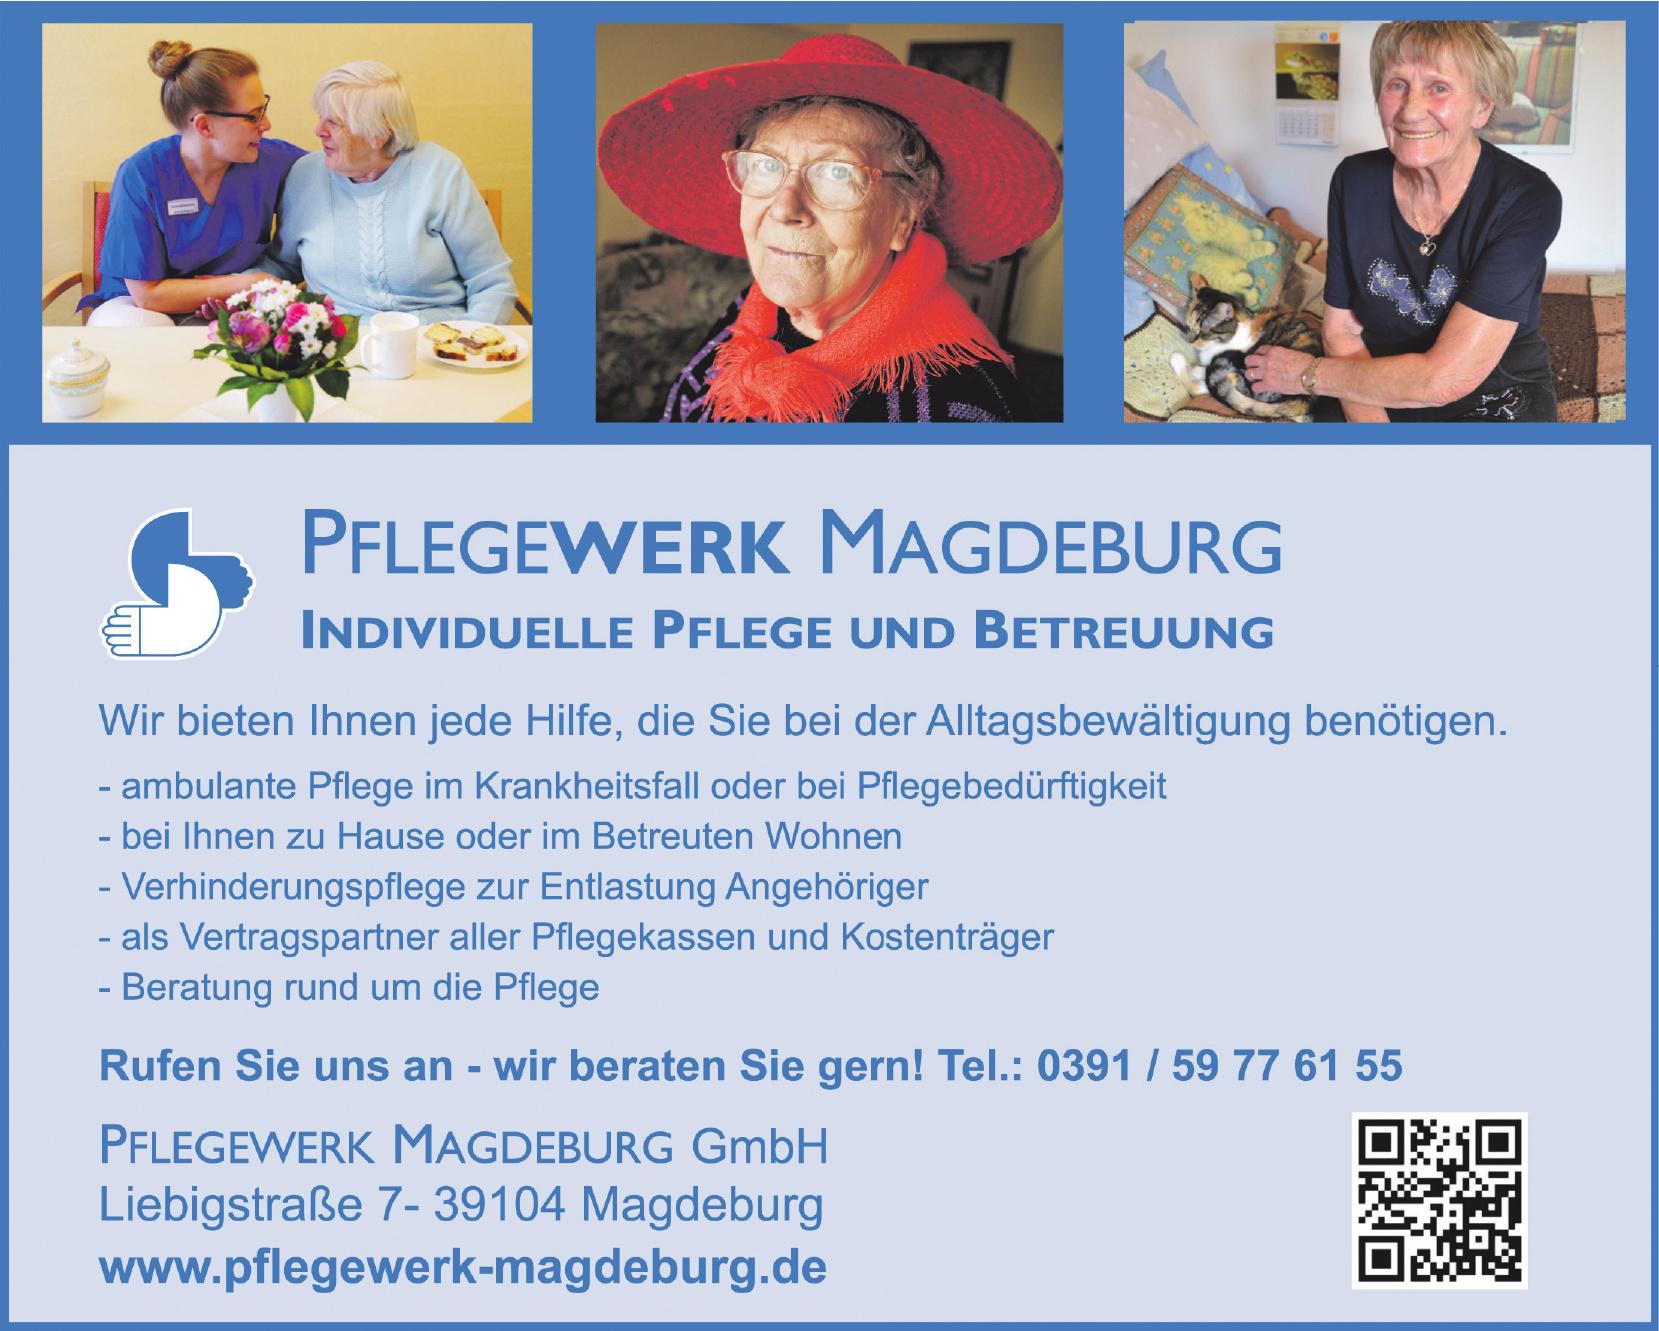 Pflegewerk Magdeburg GmbH